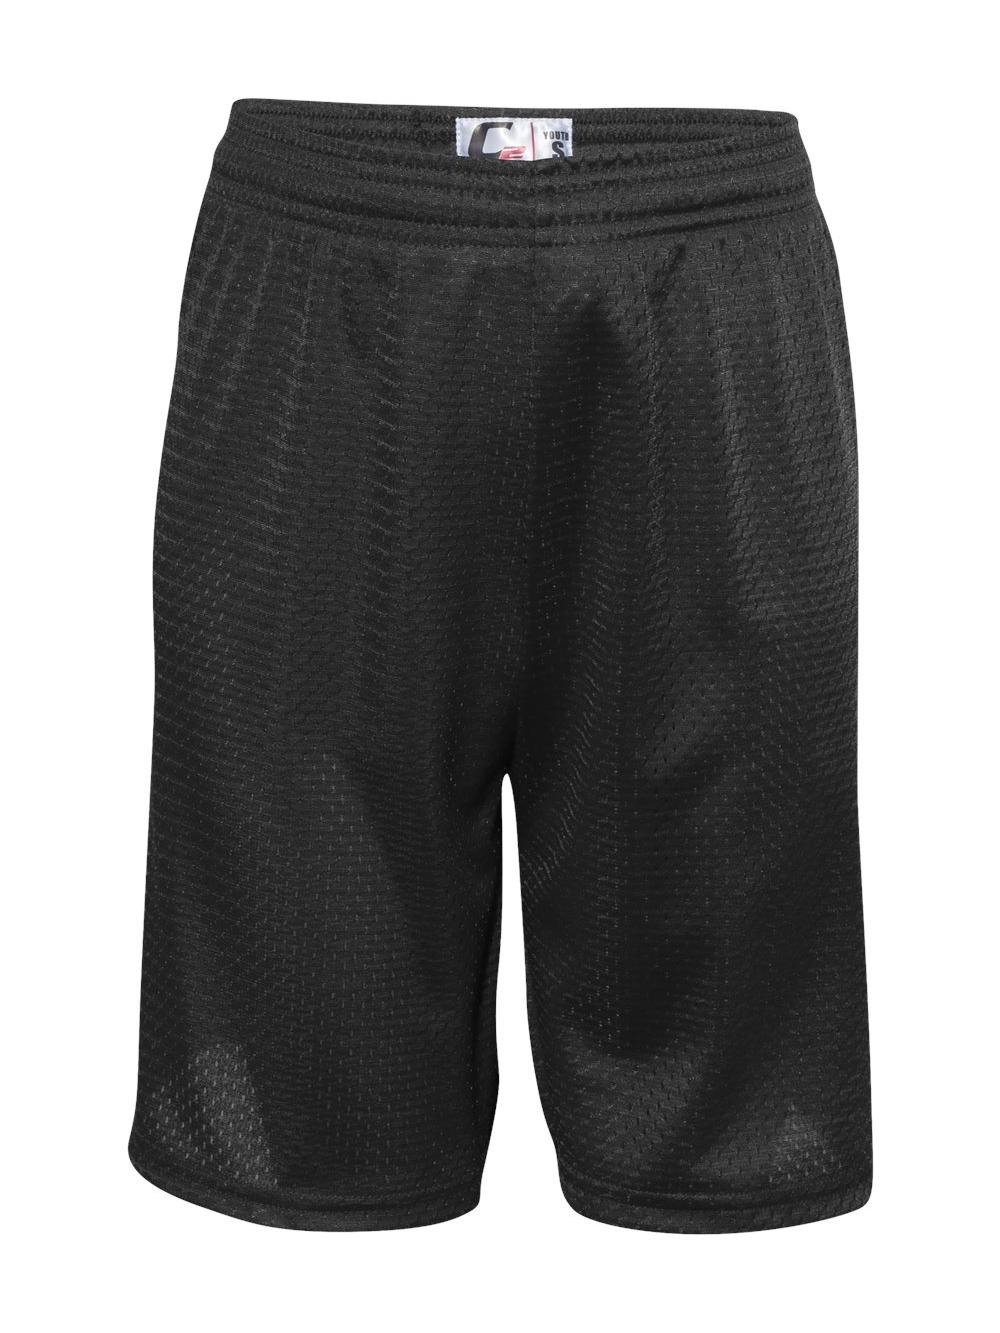 C2 Sport Athletics Mesh Youth Shorts